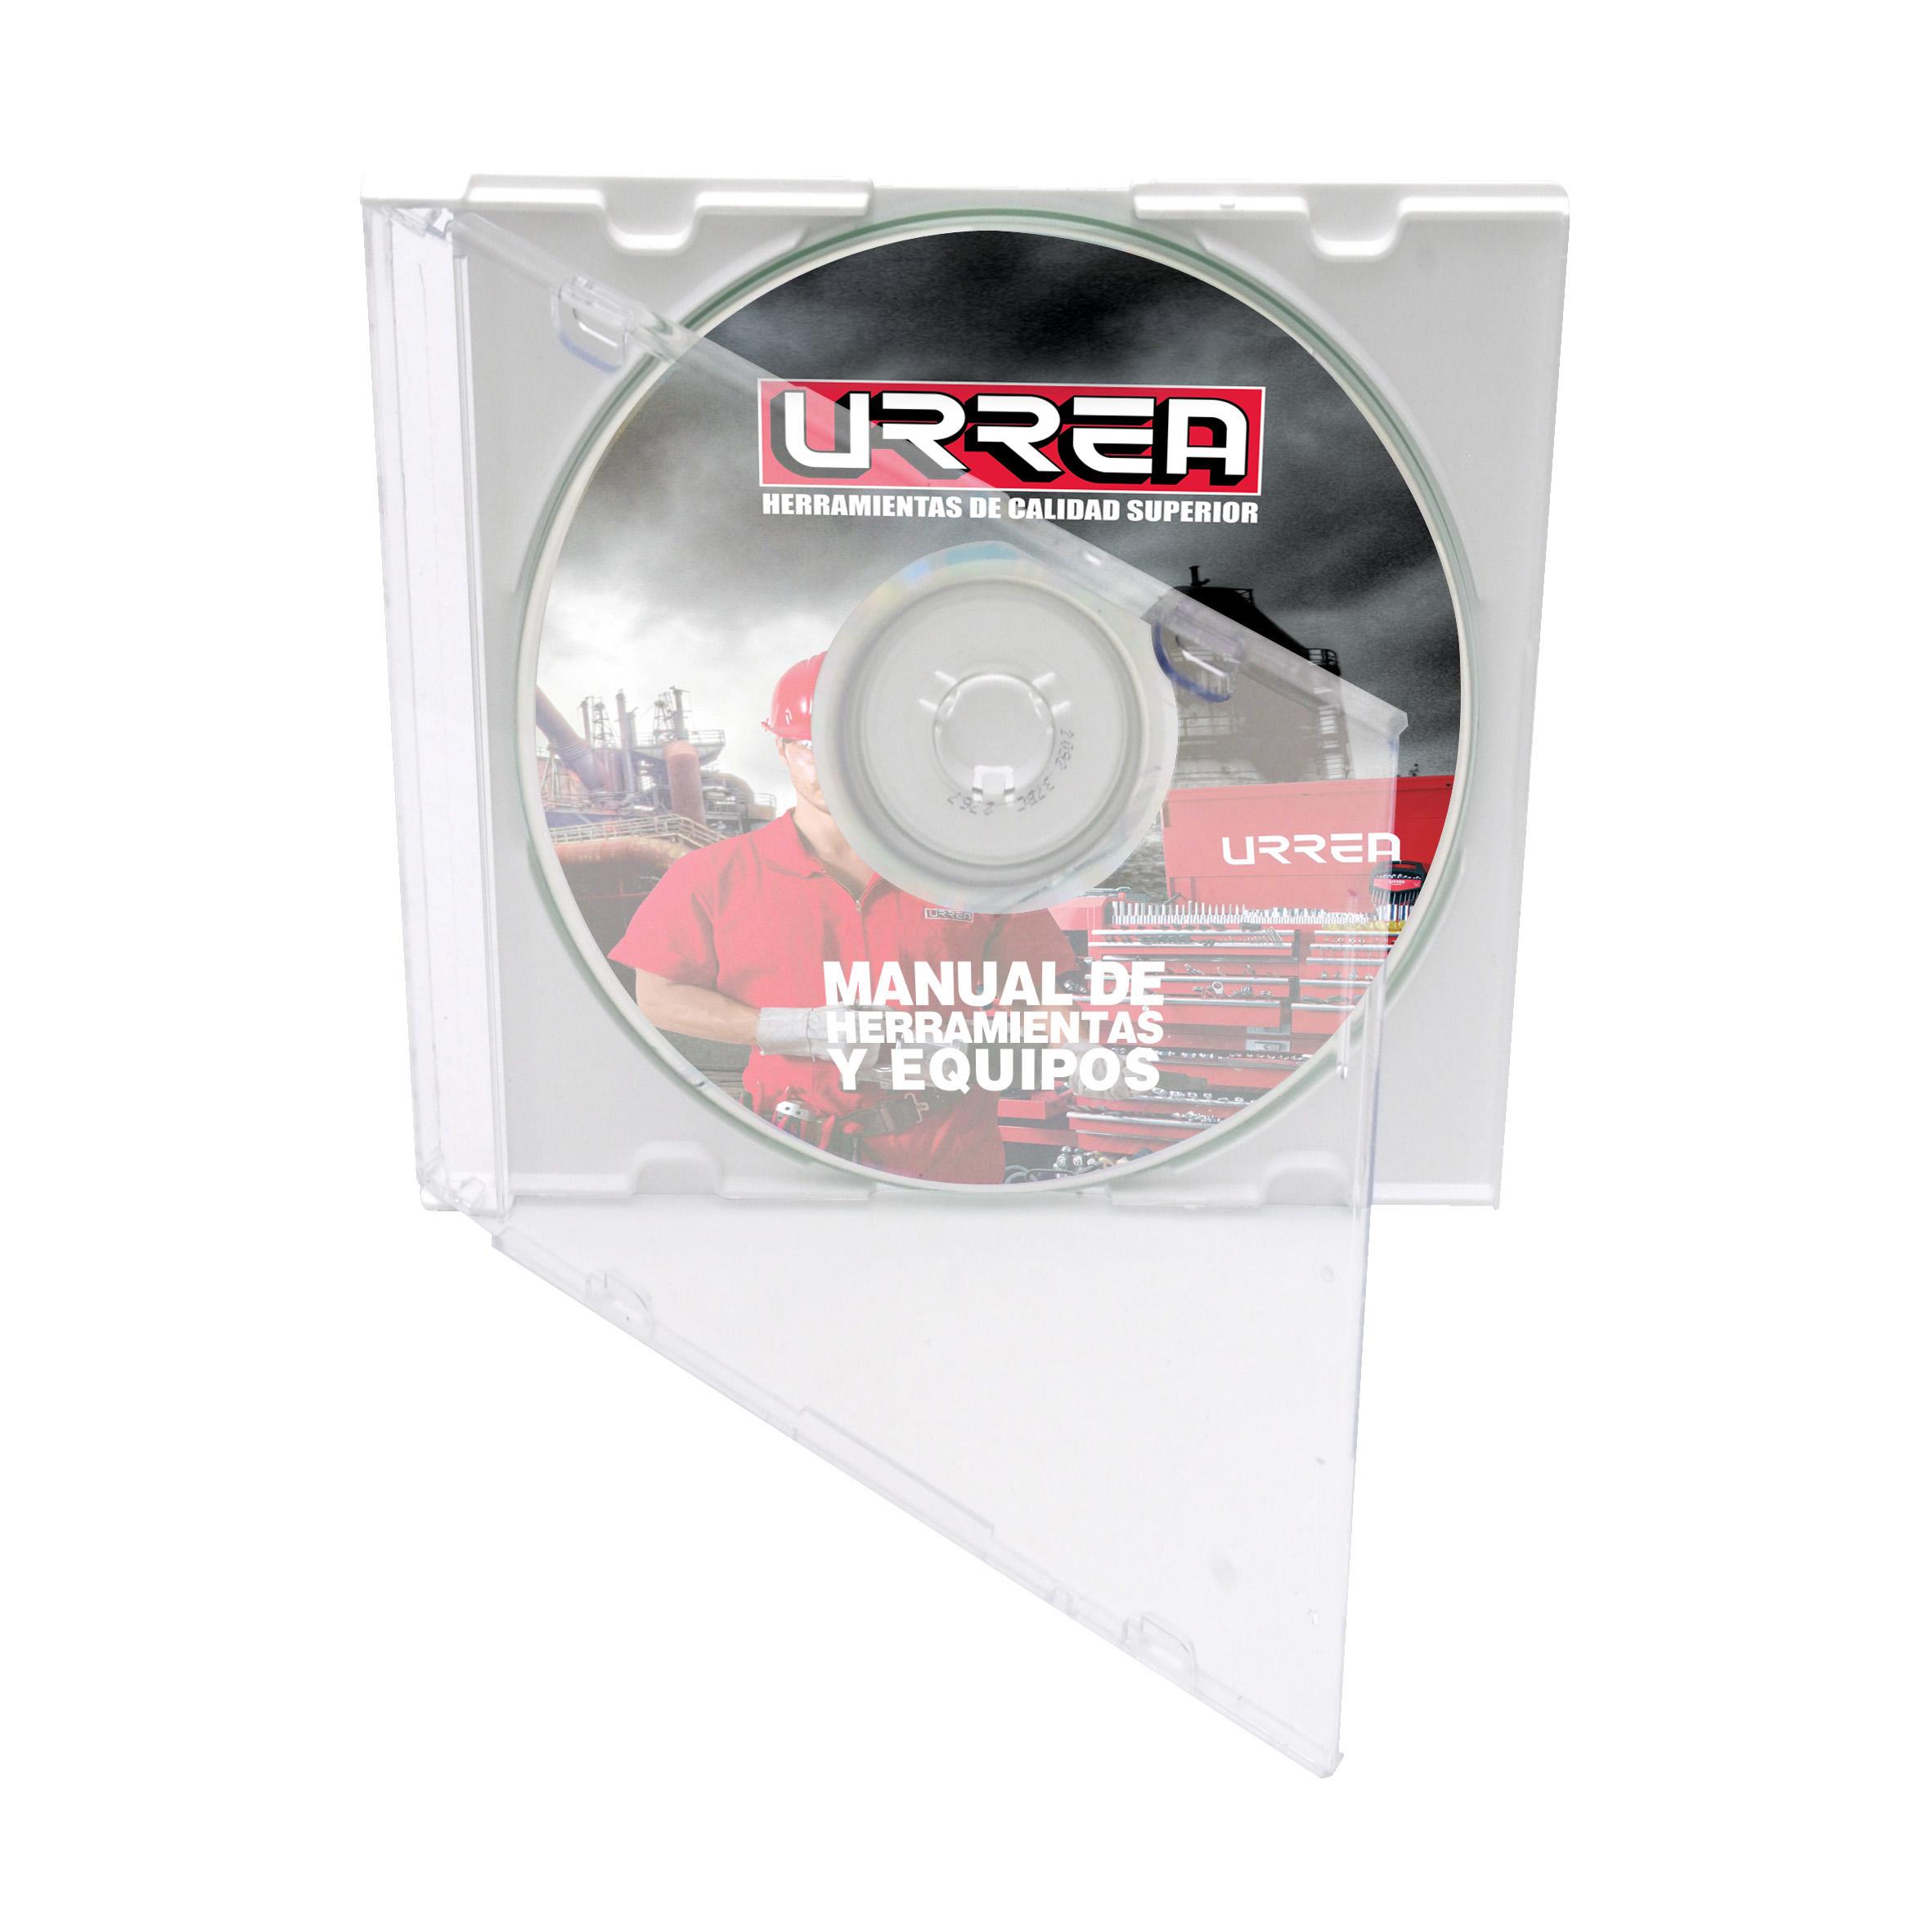 Imagen para Manual de herramientas Urrea 2010 (CD) de Grupo Urrea